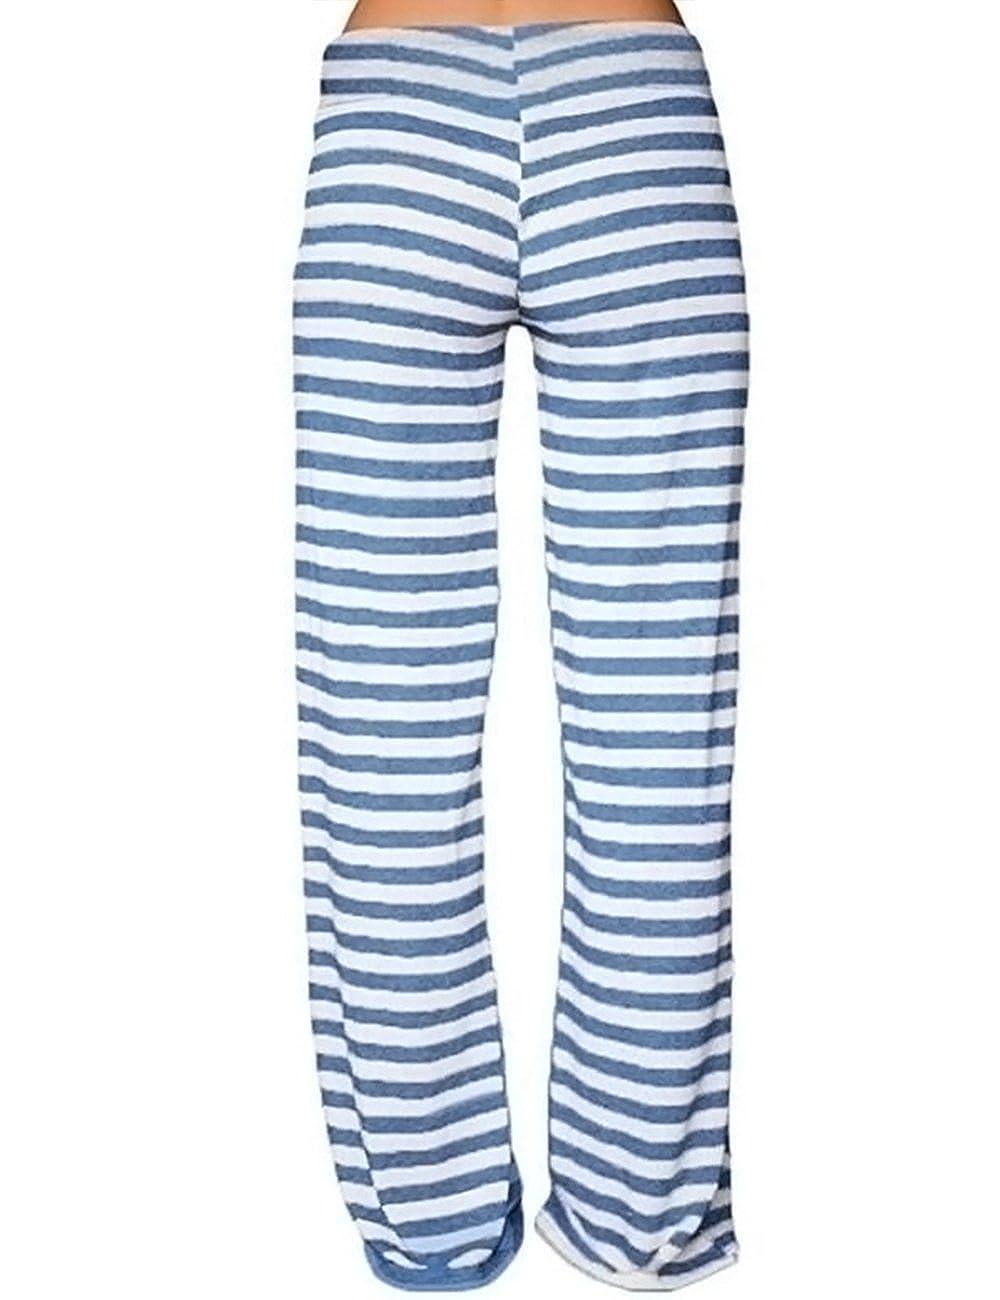 Imagine Womens Wide Leg High Waist Yoga Palazzo Pants Pineapple Printed Drawstring Trousers Workout Sports Pants Leggings